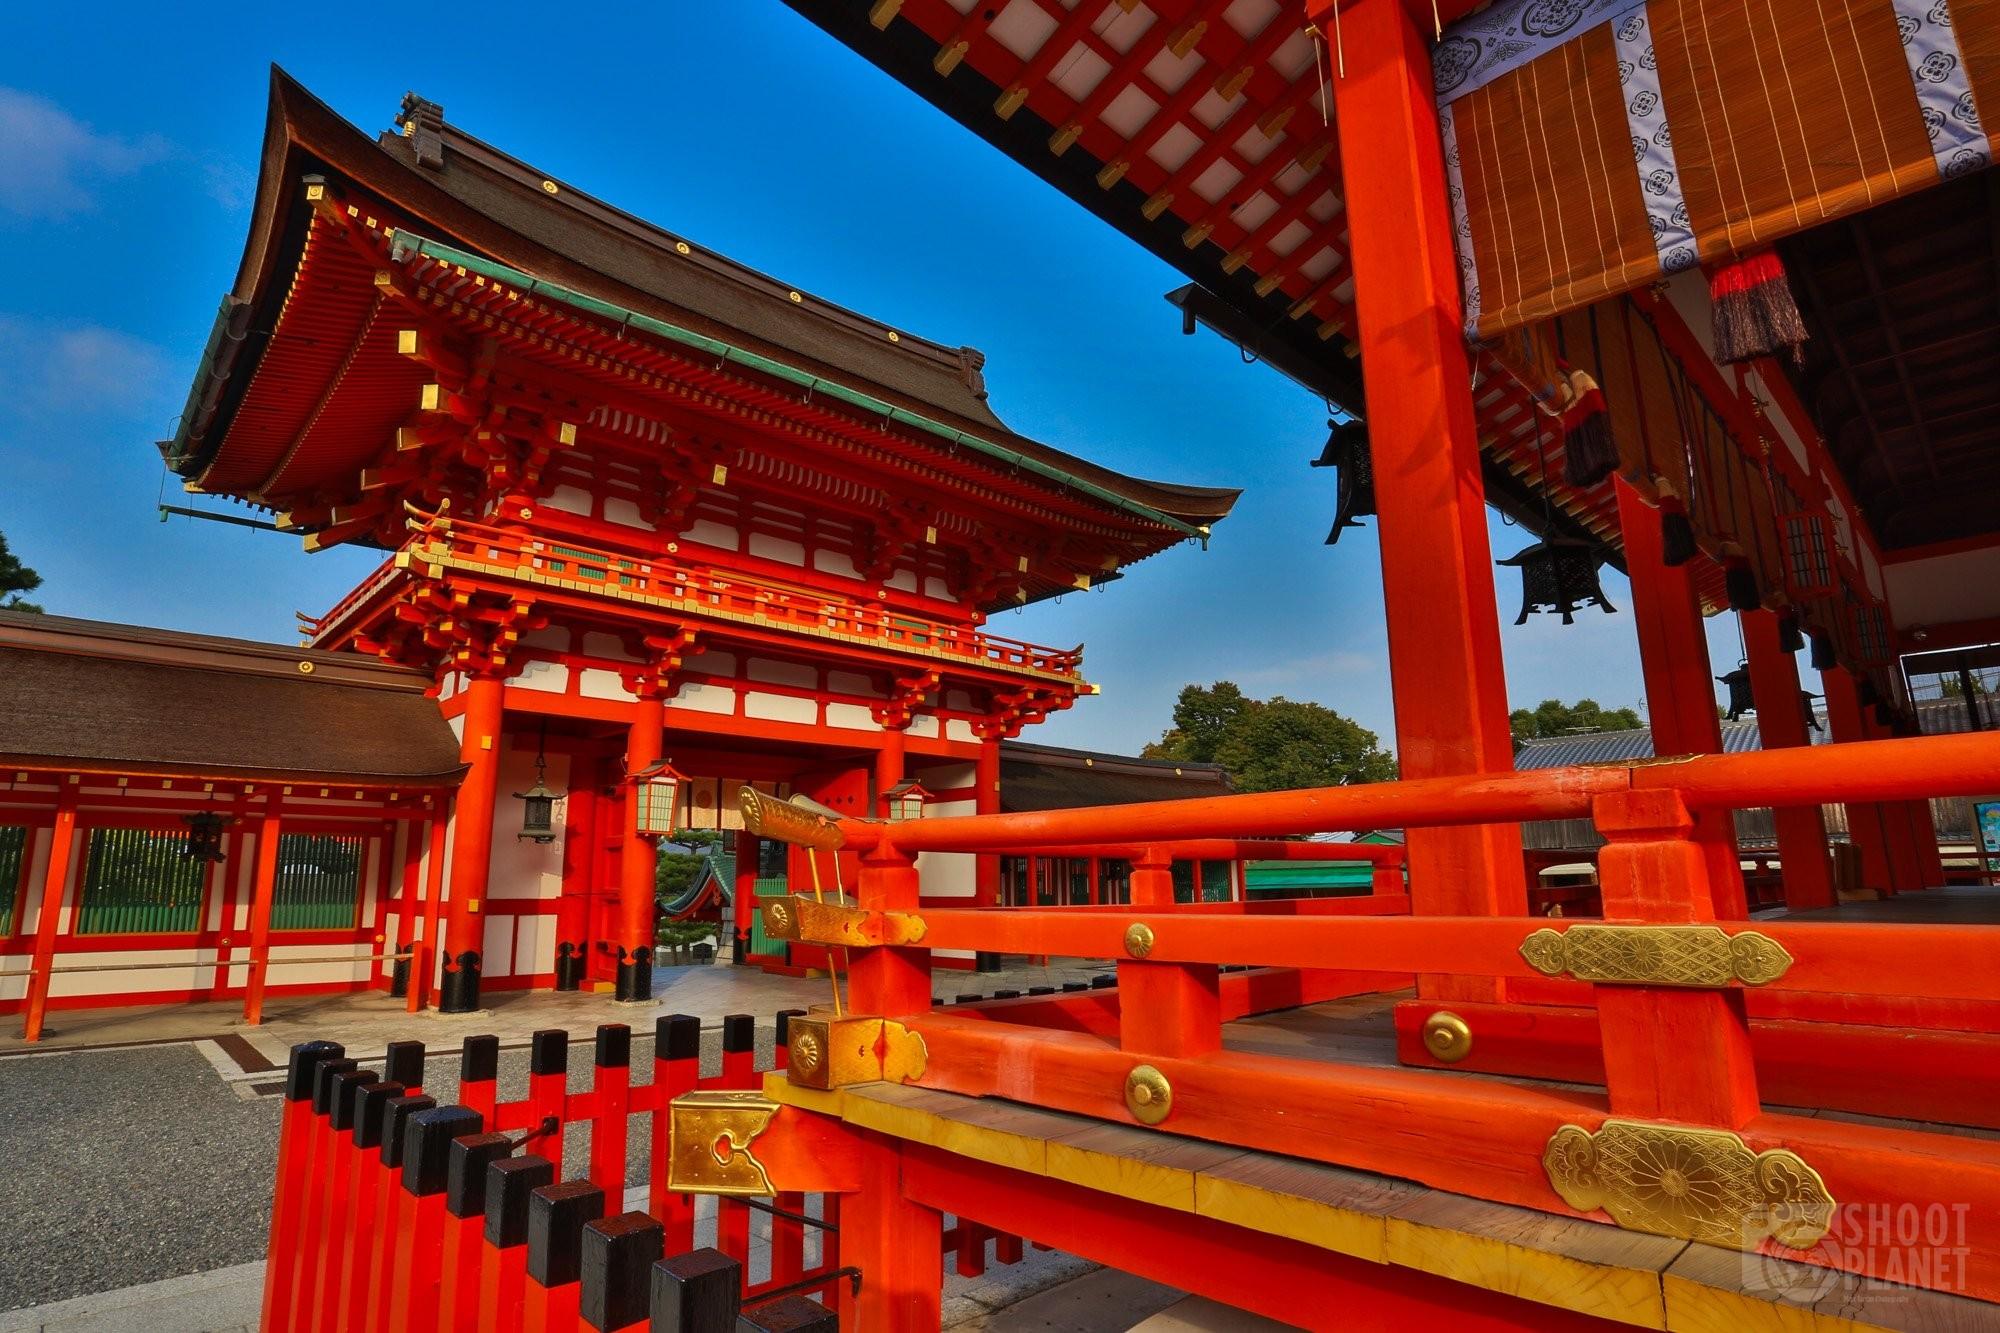 Main gate of Fushimi Inari Shrine, Kyoto